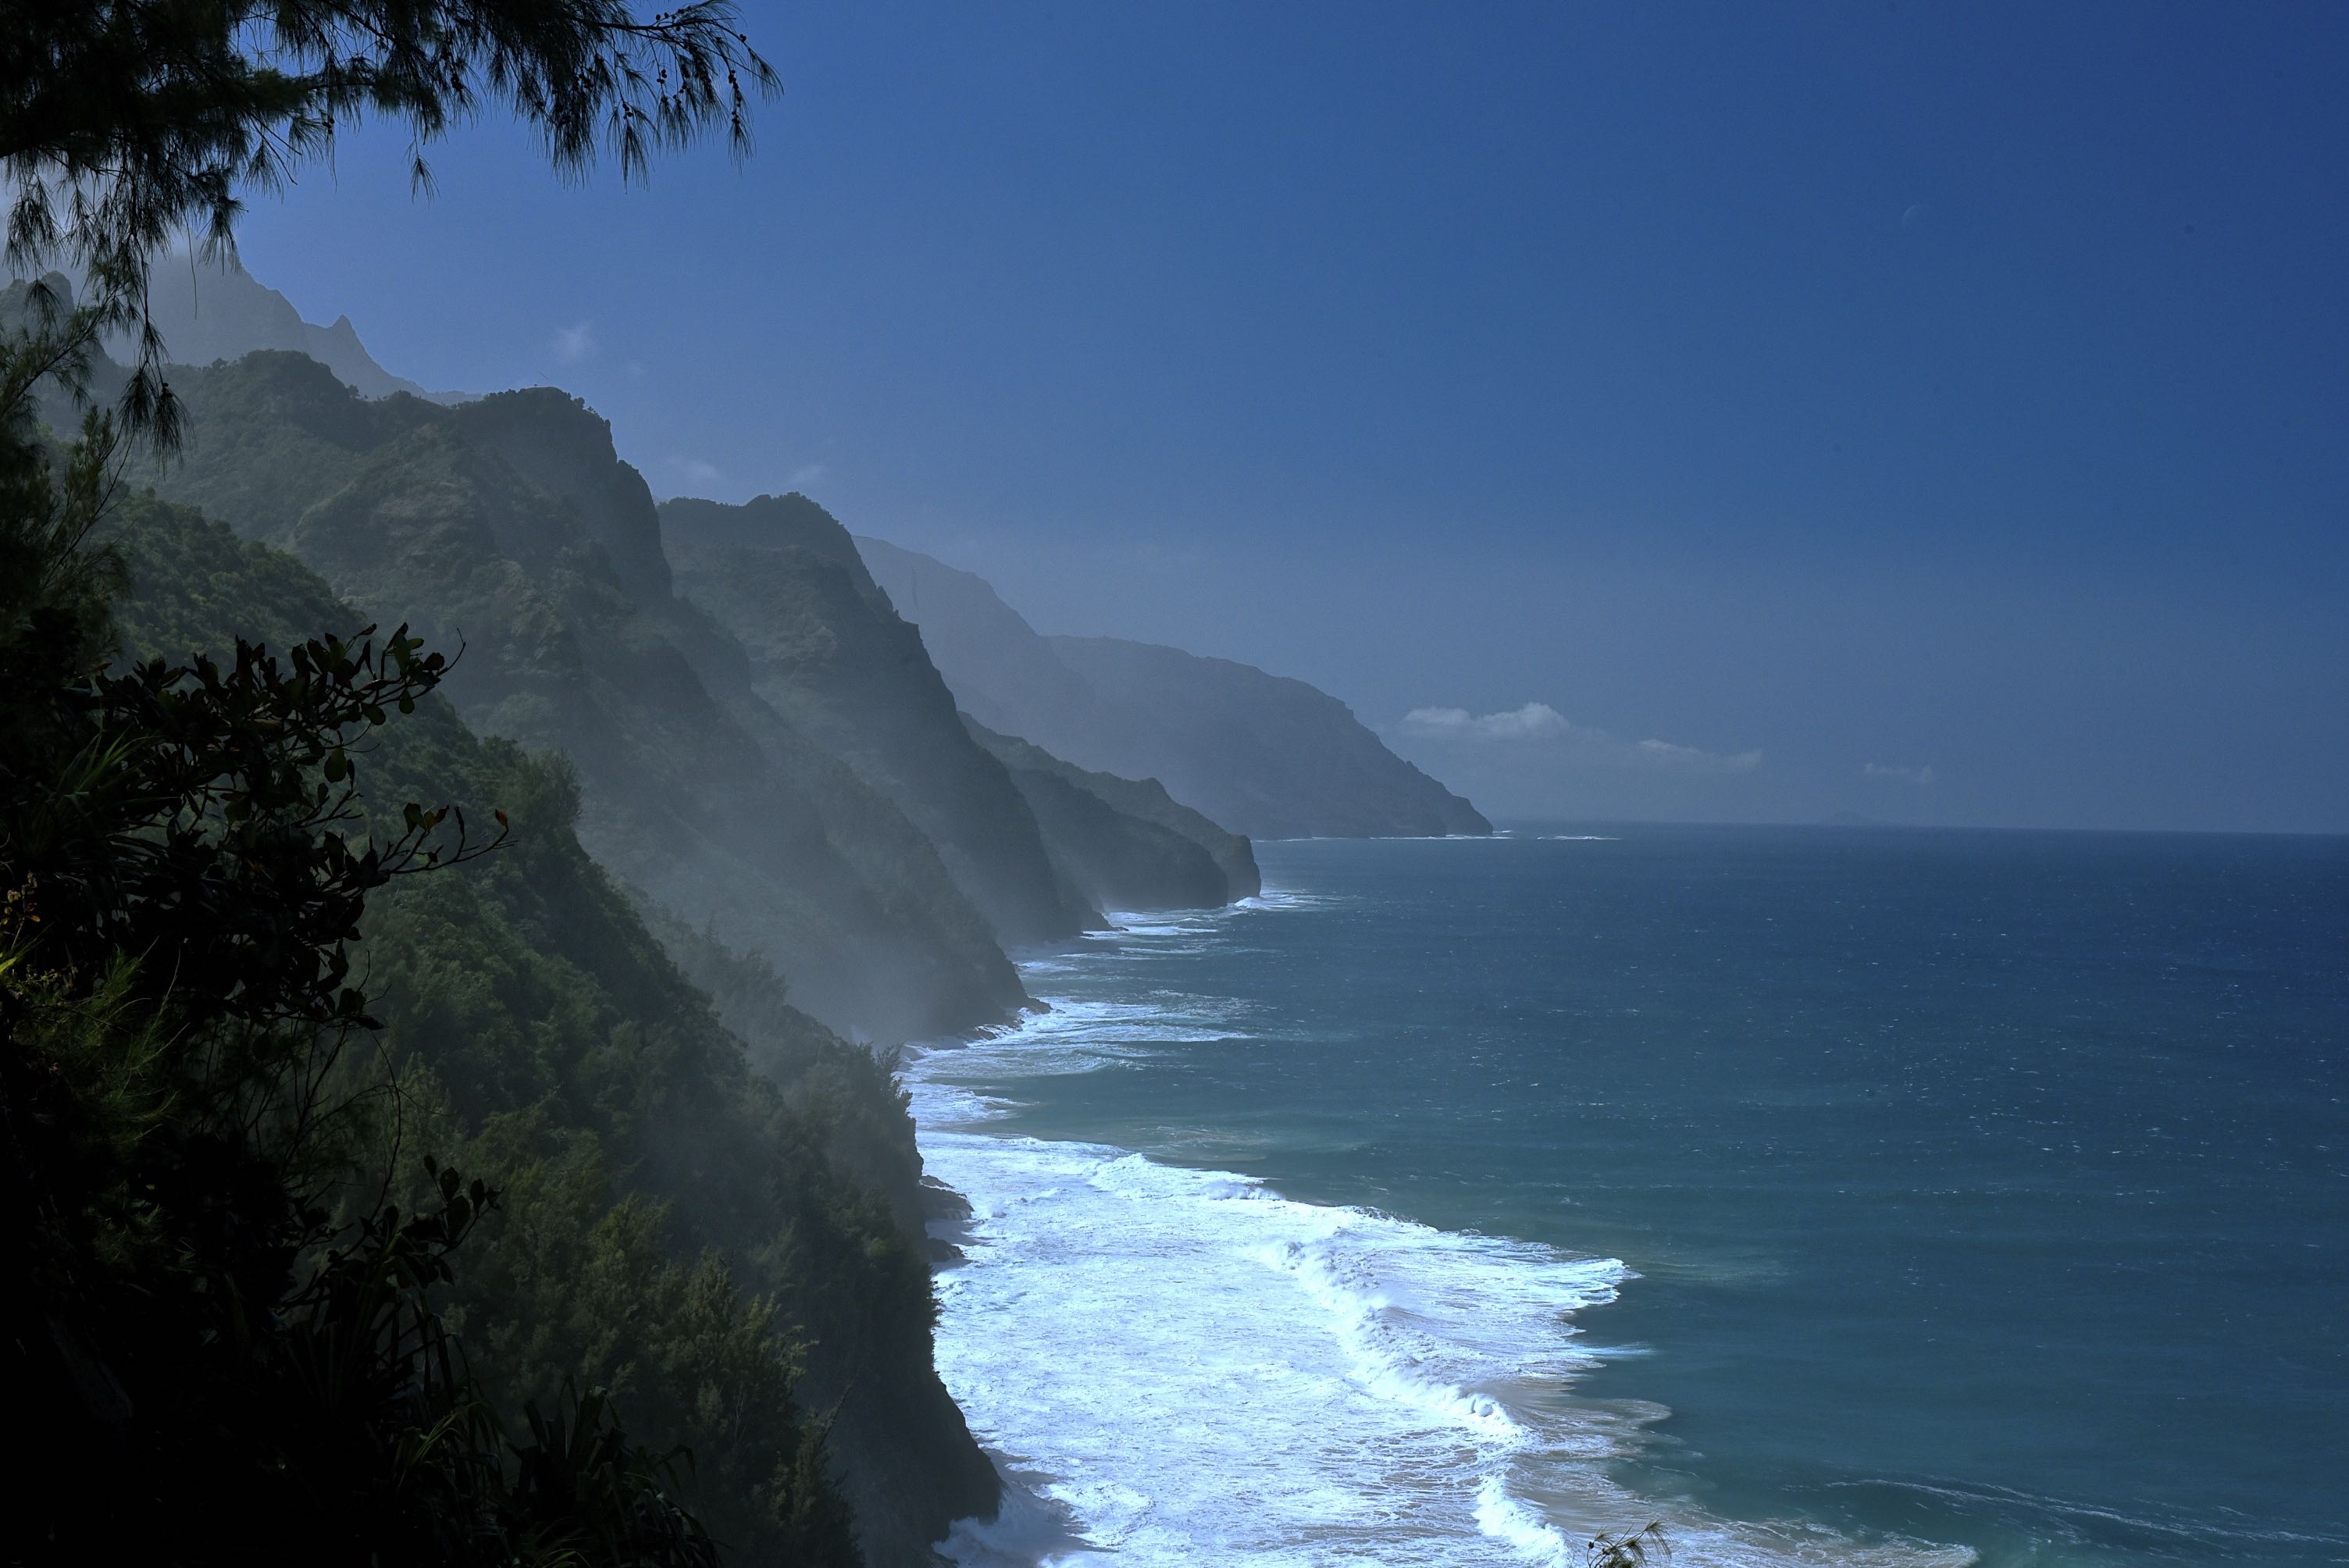 The Napali Coast